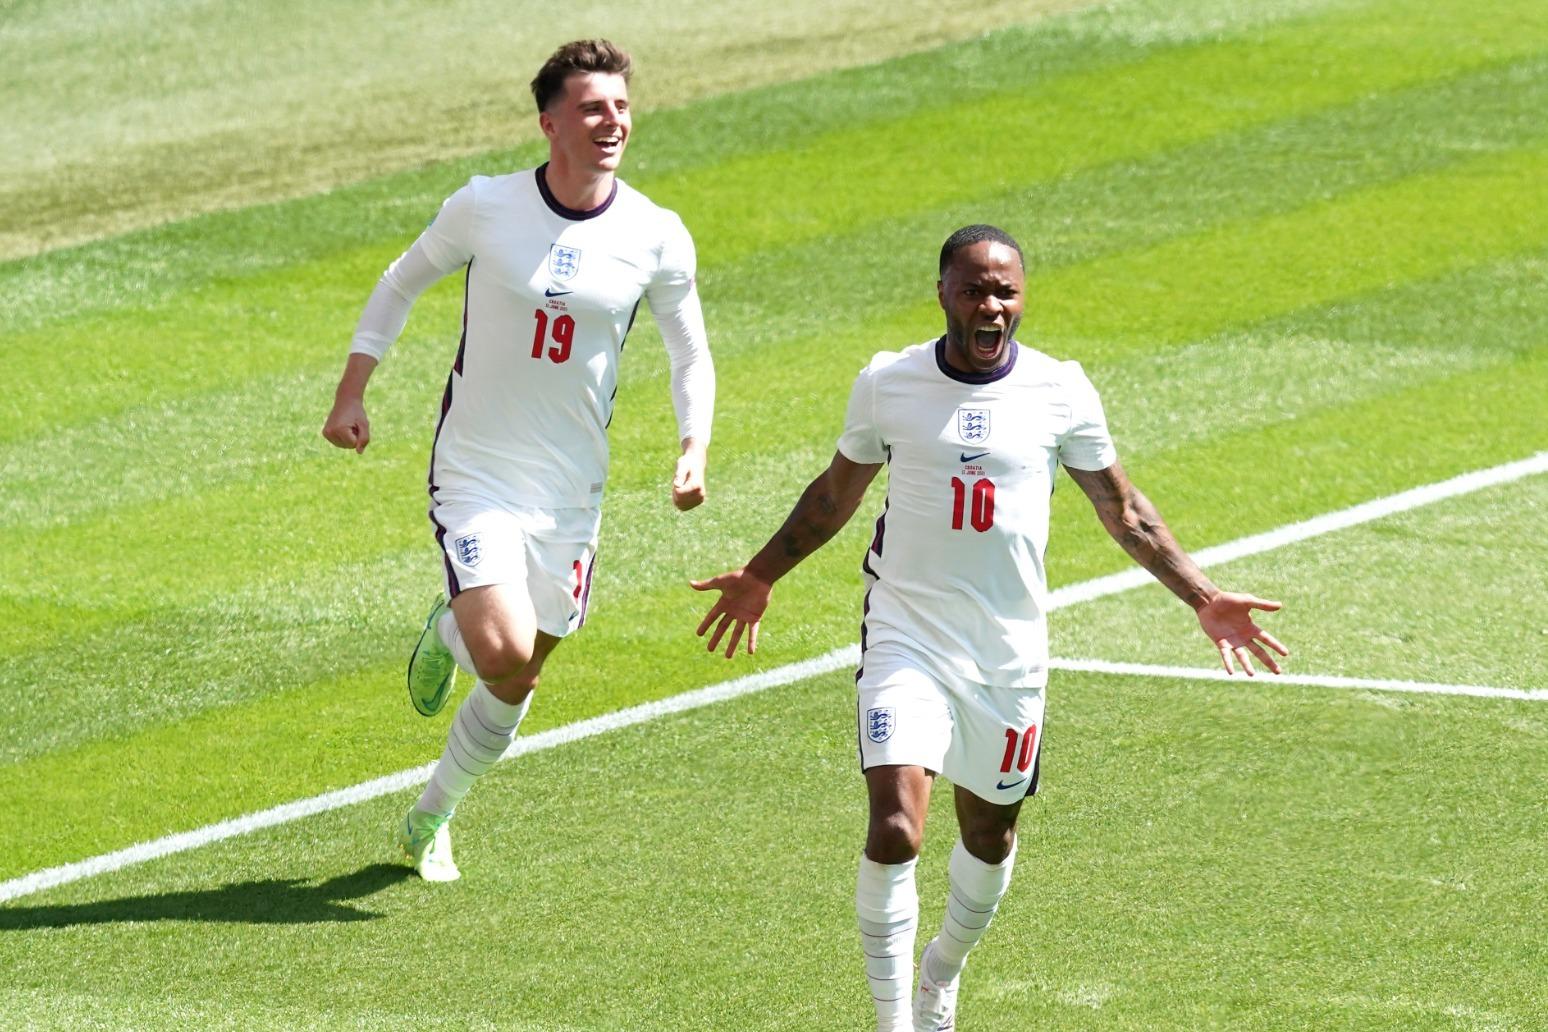 England beat Croatia 1-0 in their Euro 2020 opener at Wembley